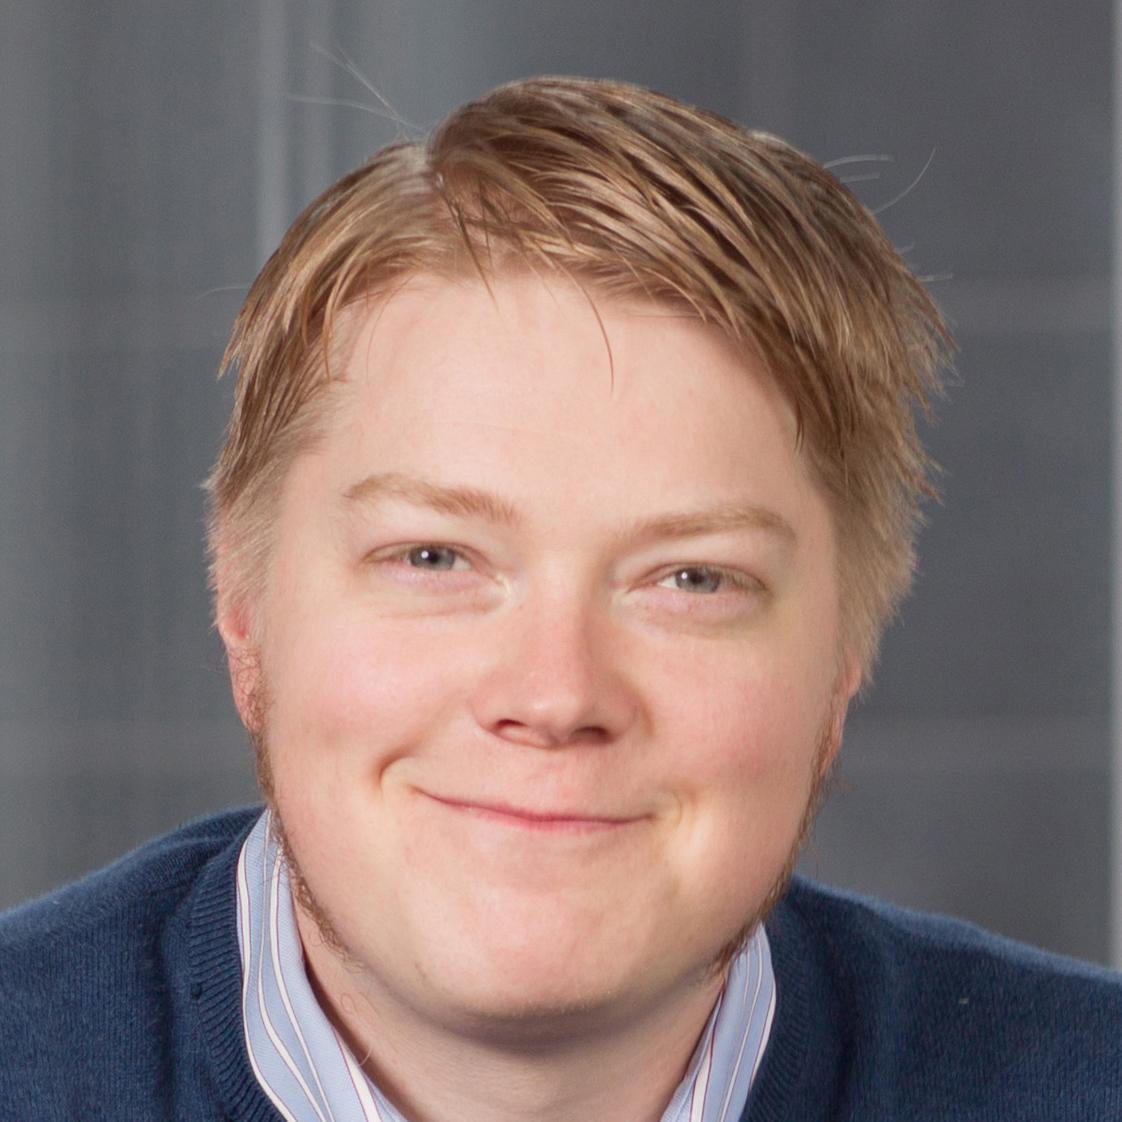 Johannes Pernaa